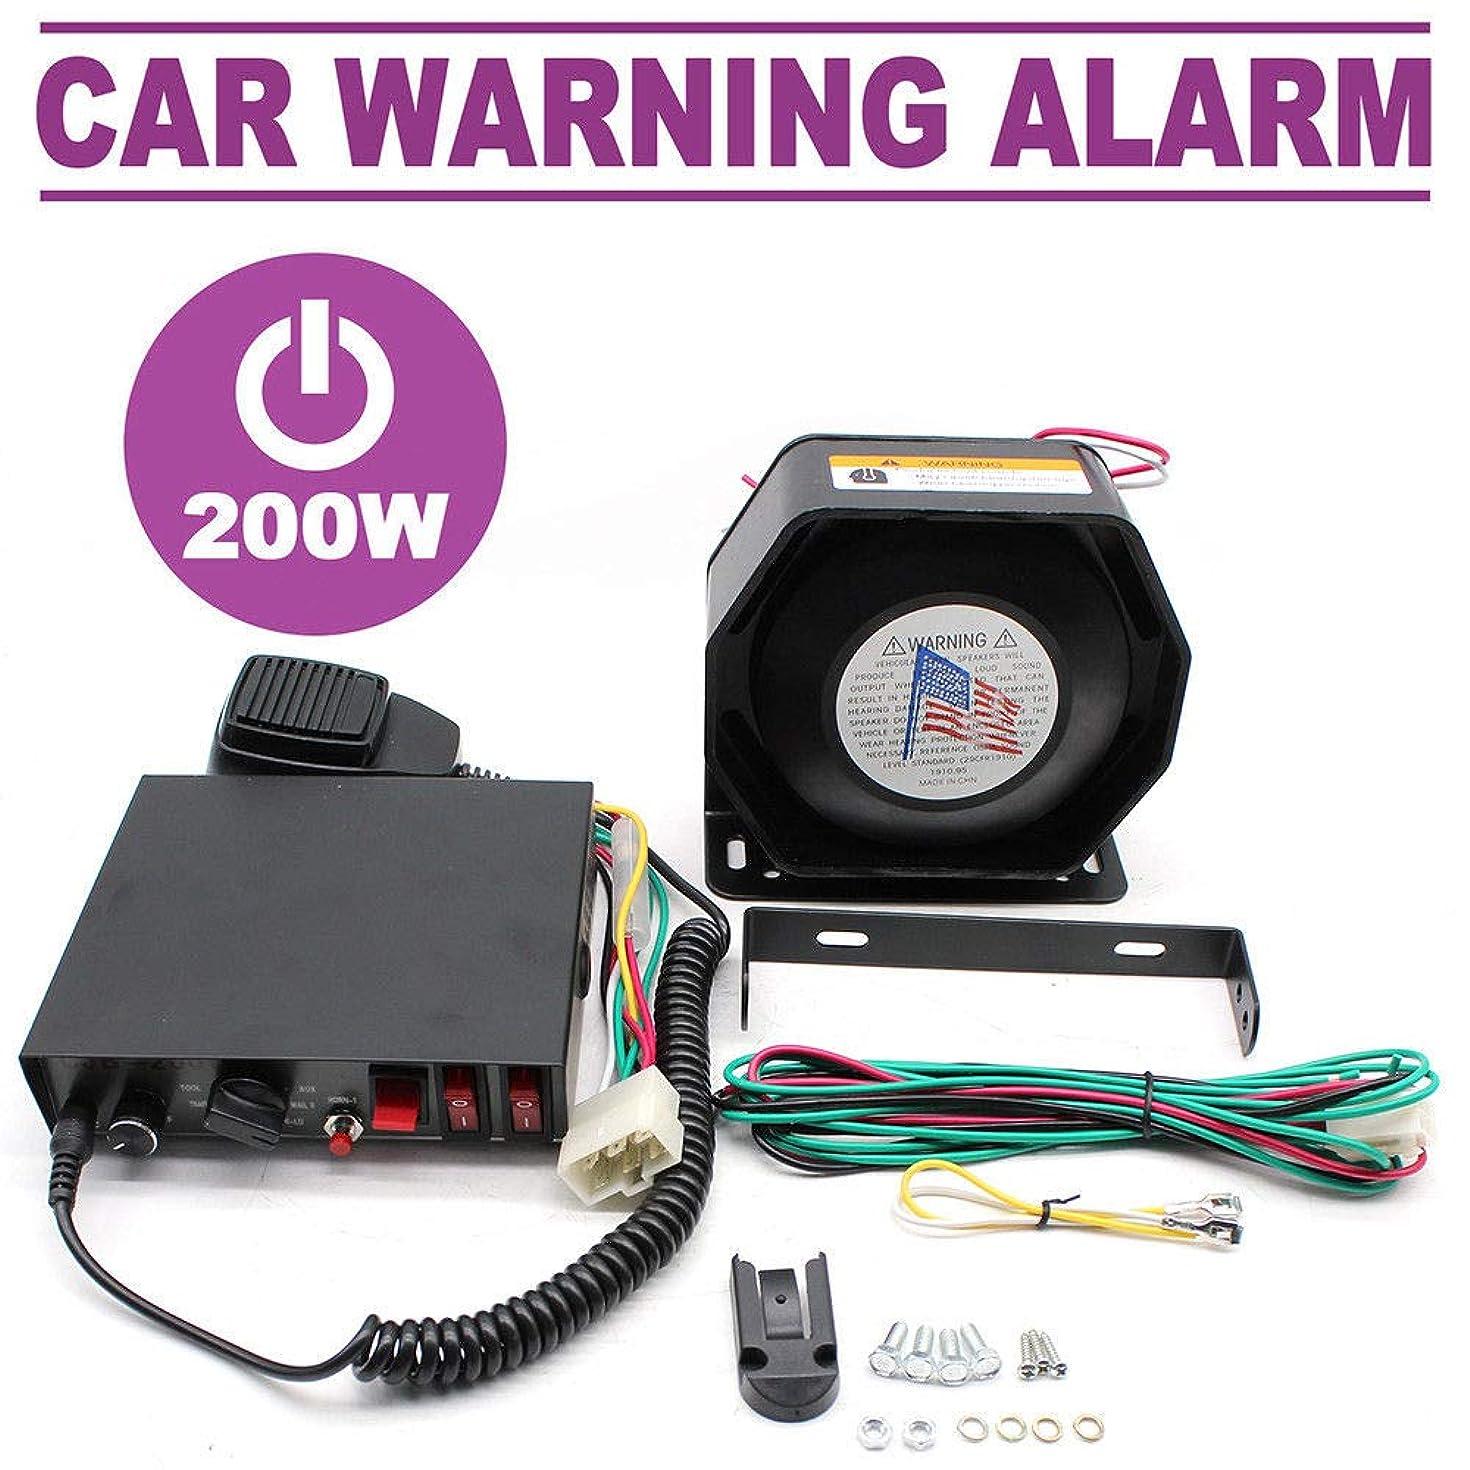 Car Alarm Speaker Kit, 200W 12V 8 Sound Well Loud Speaker PA Horn Siren System Mic Kit Police Plastic with English Manual- 2 Year Warrenty